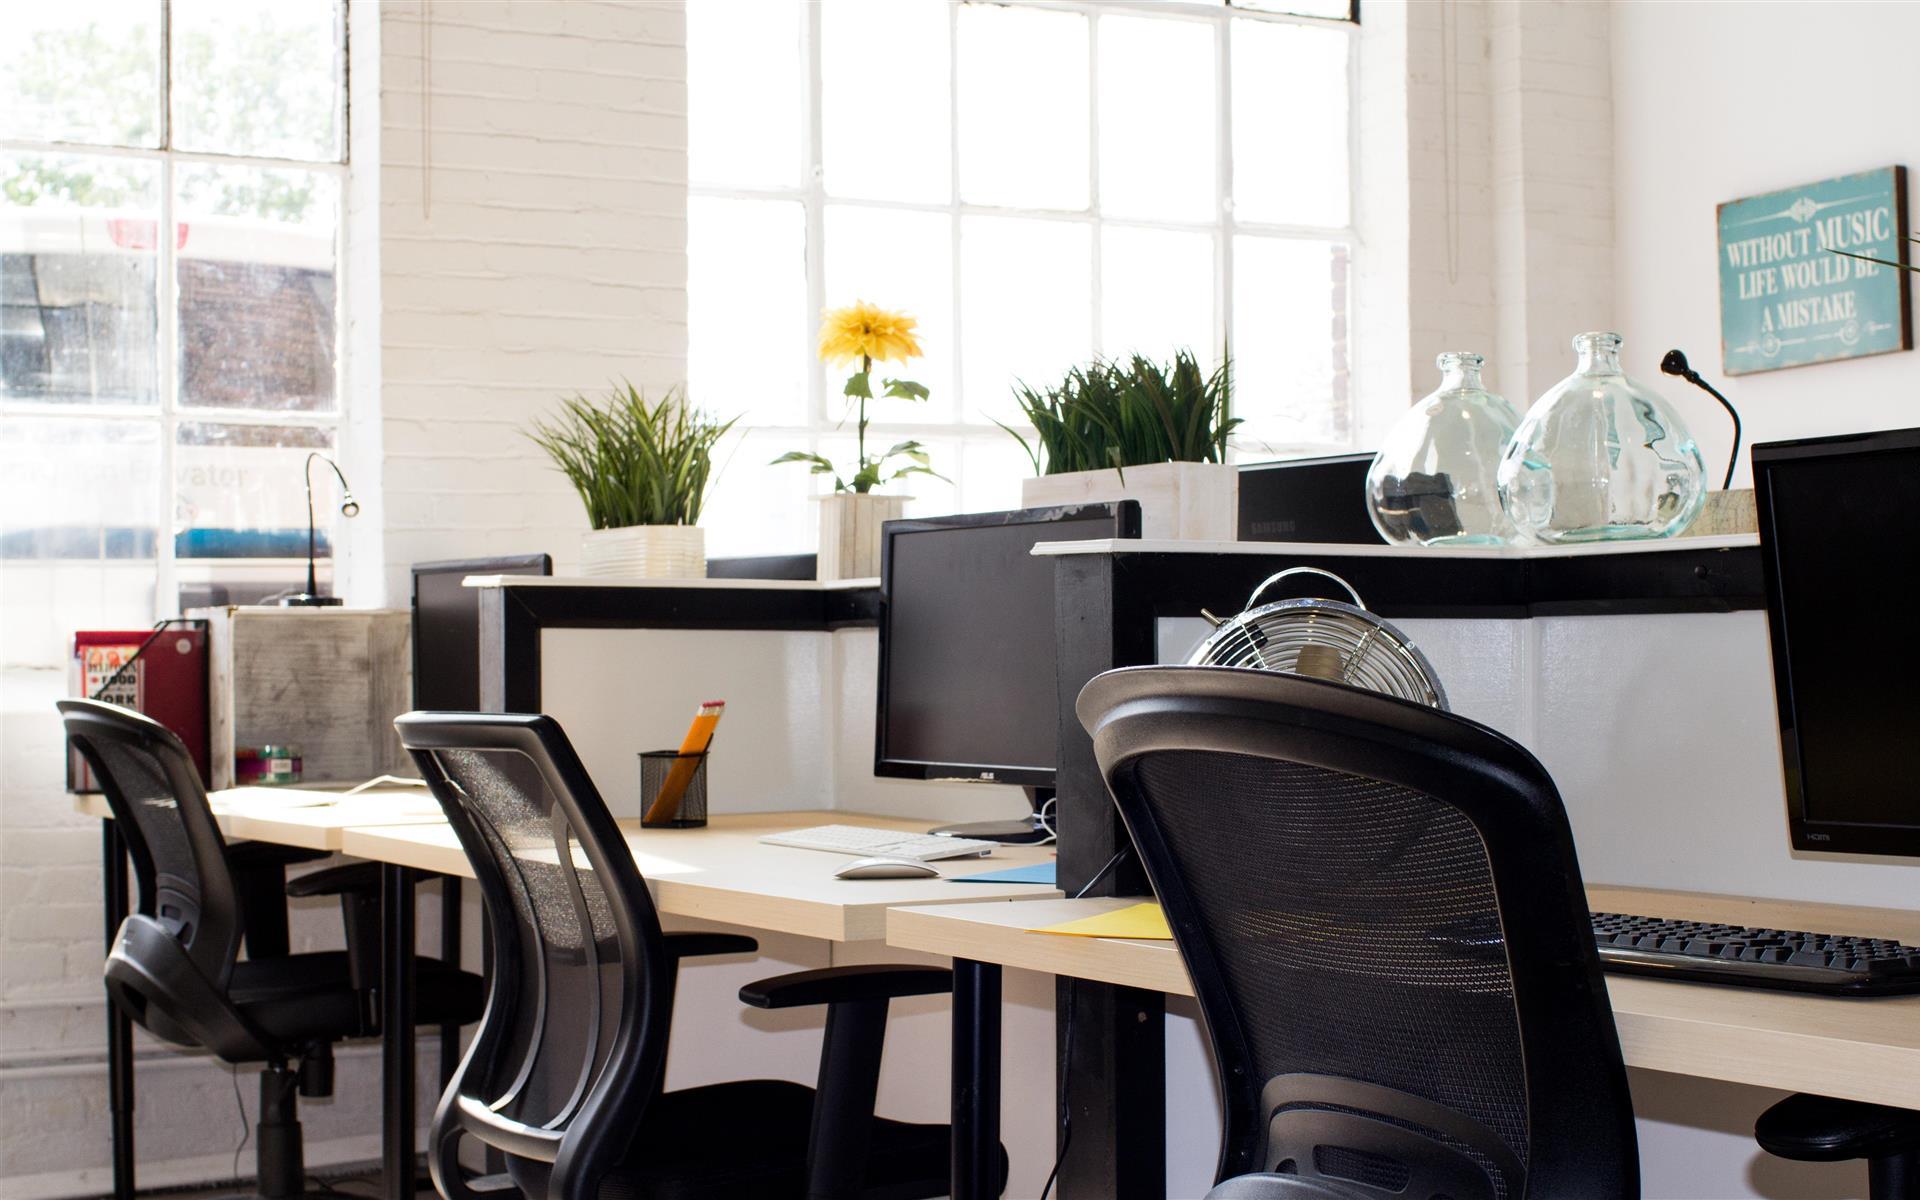 District 28 WorkSpace - Dedicated Desk (WorkSpace 3)